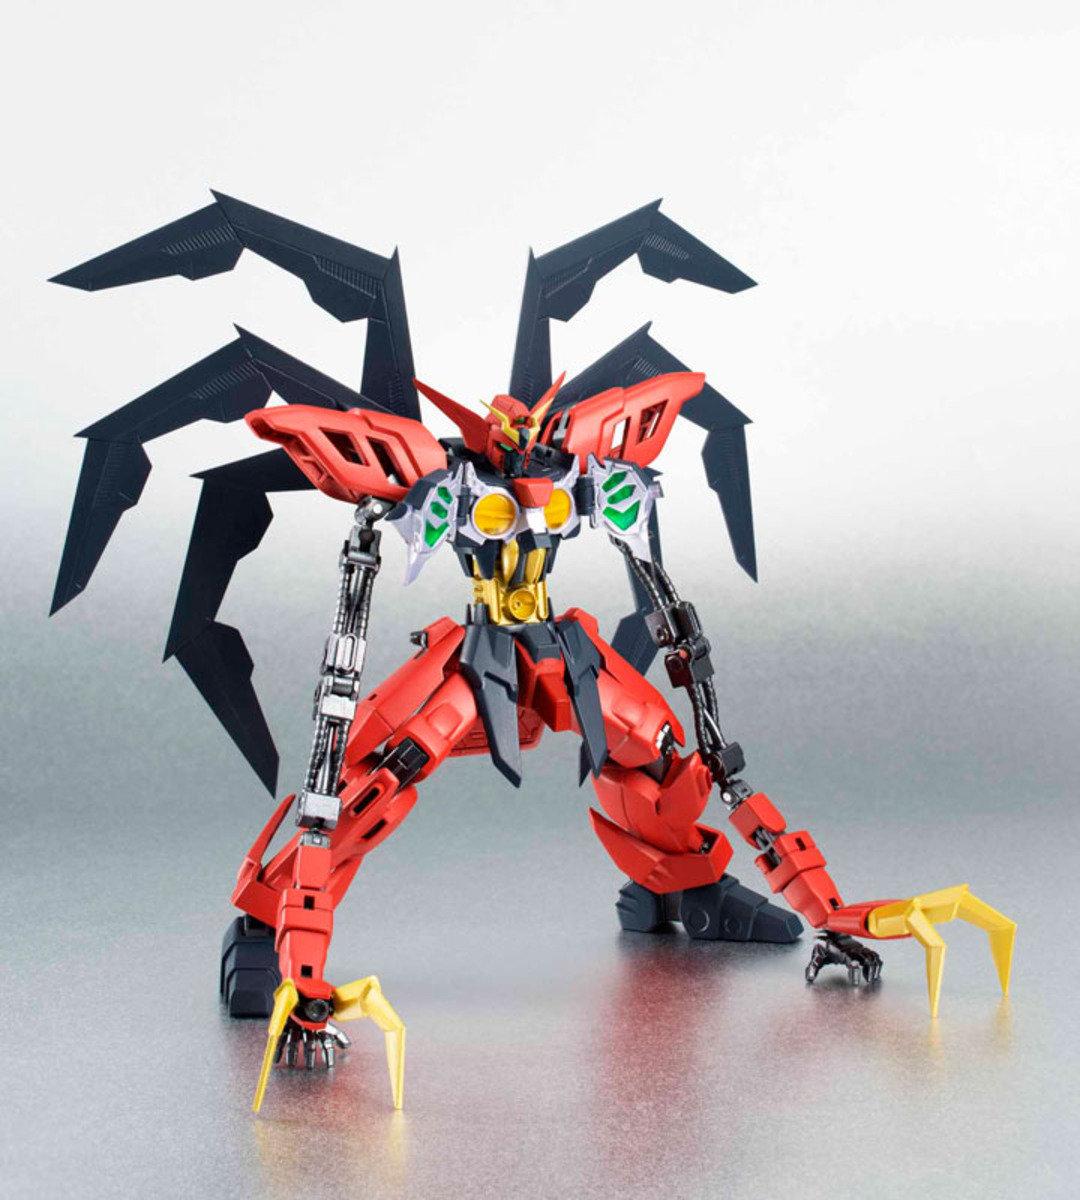 Robot 魂  No. 163 機動新世紀GUNDAM X - 華沙哥 高達 (Chest Breake)